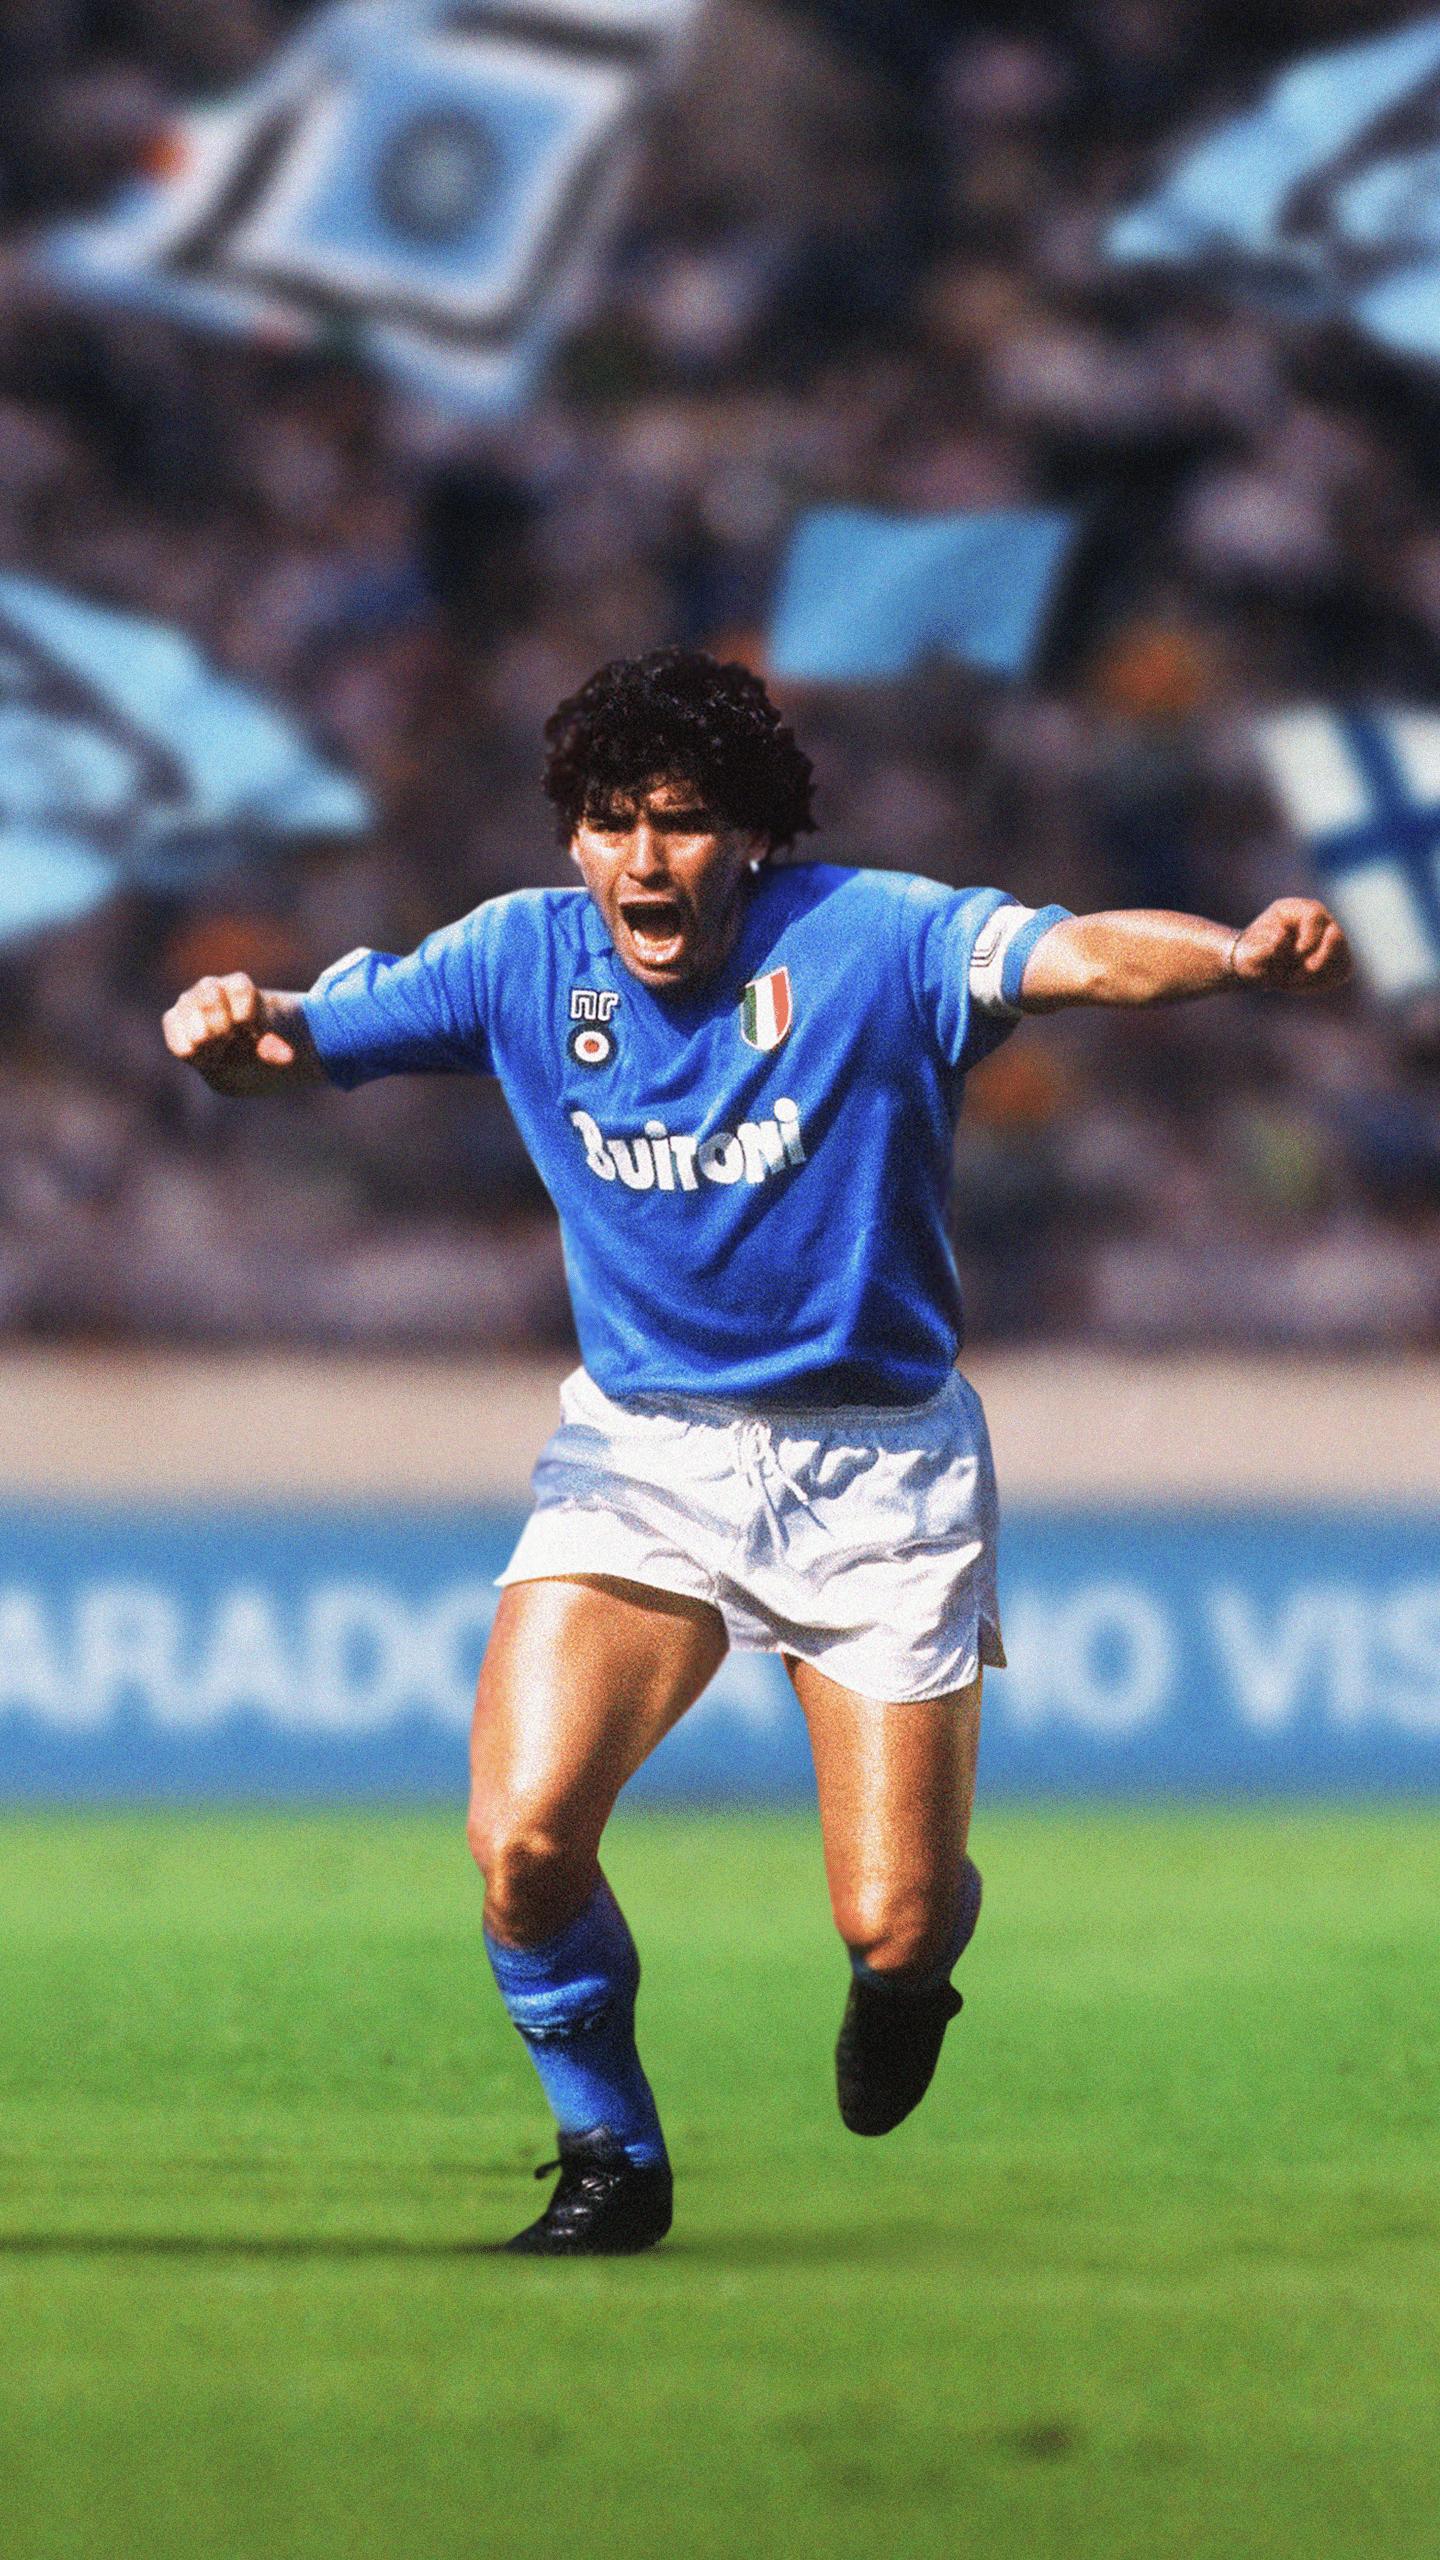 Maradona Wallpapers Top Free Maradona Backgrounds Wallpaperaccess